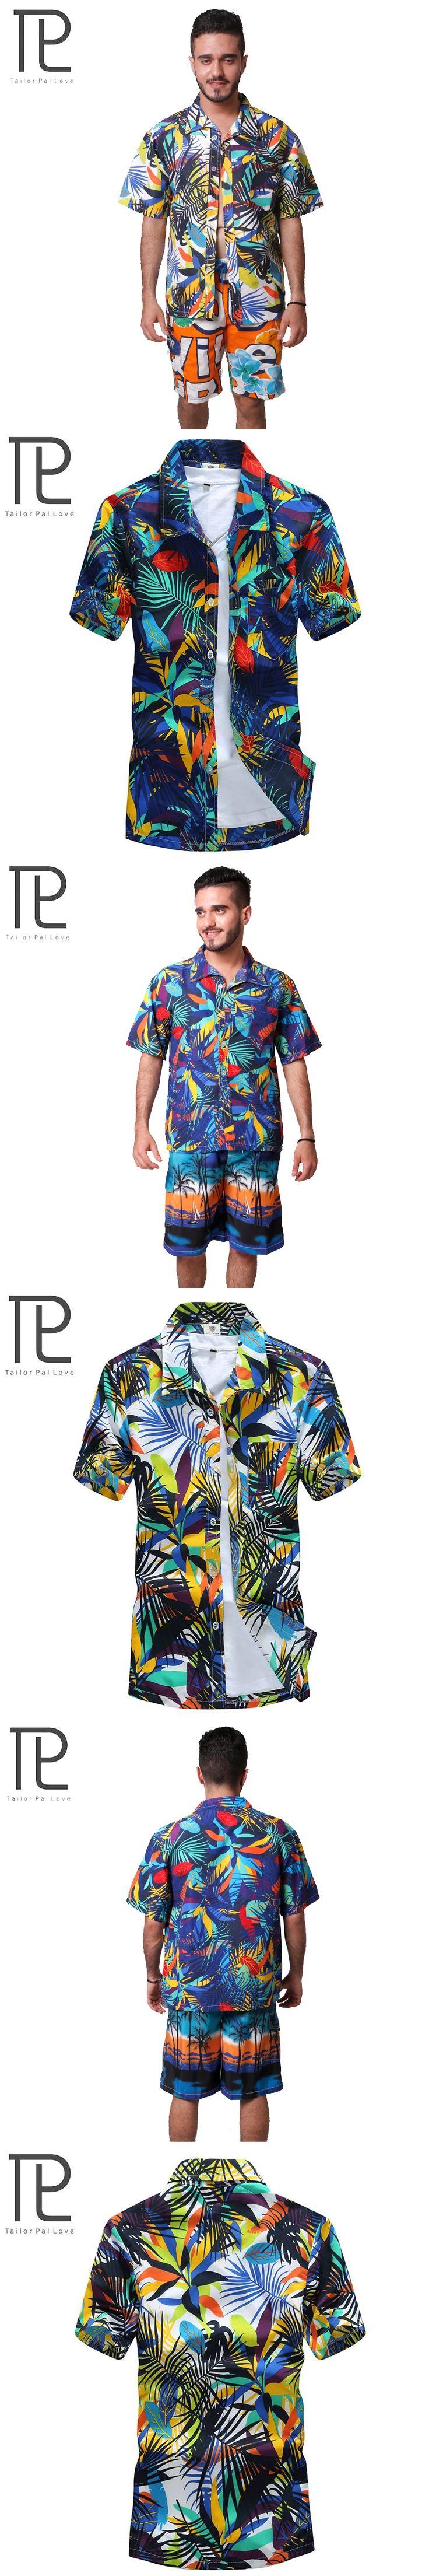 Tailor Pal Love 2017 Summer Mens Hawaiian Shirt Casual Printing Designer Short Sleeve Beach Shirts For Men